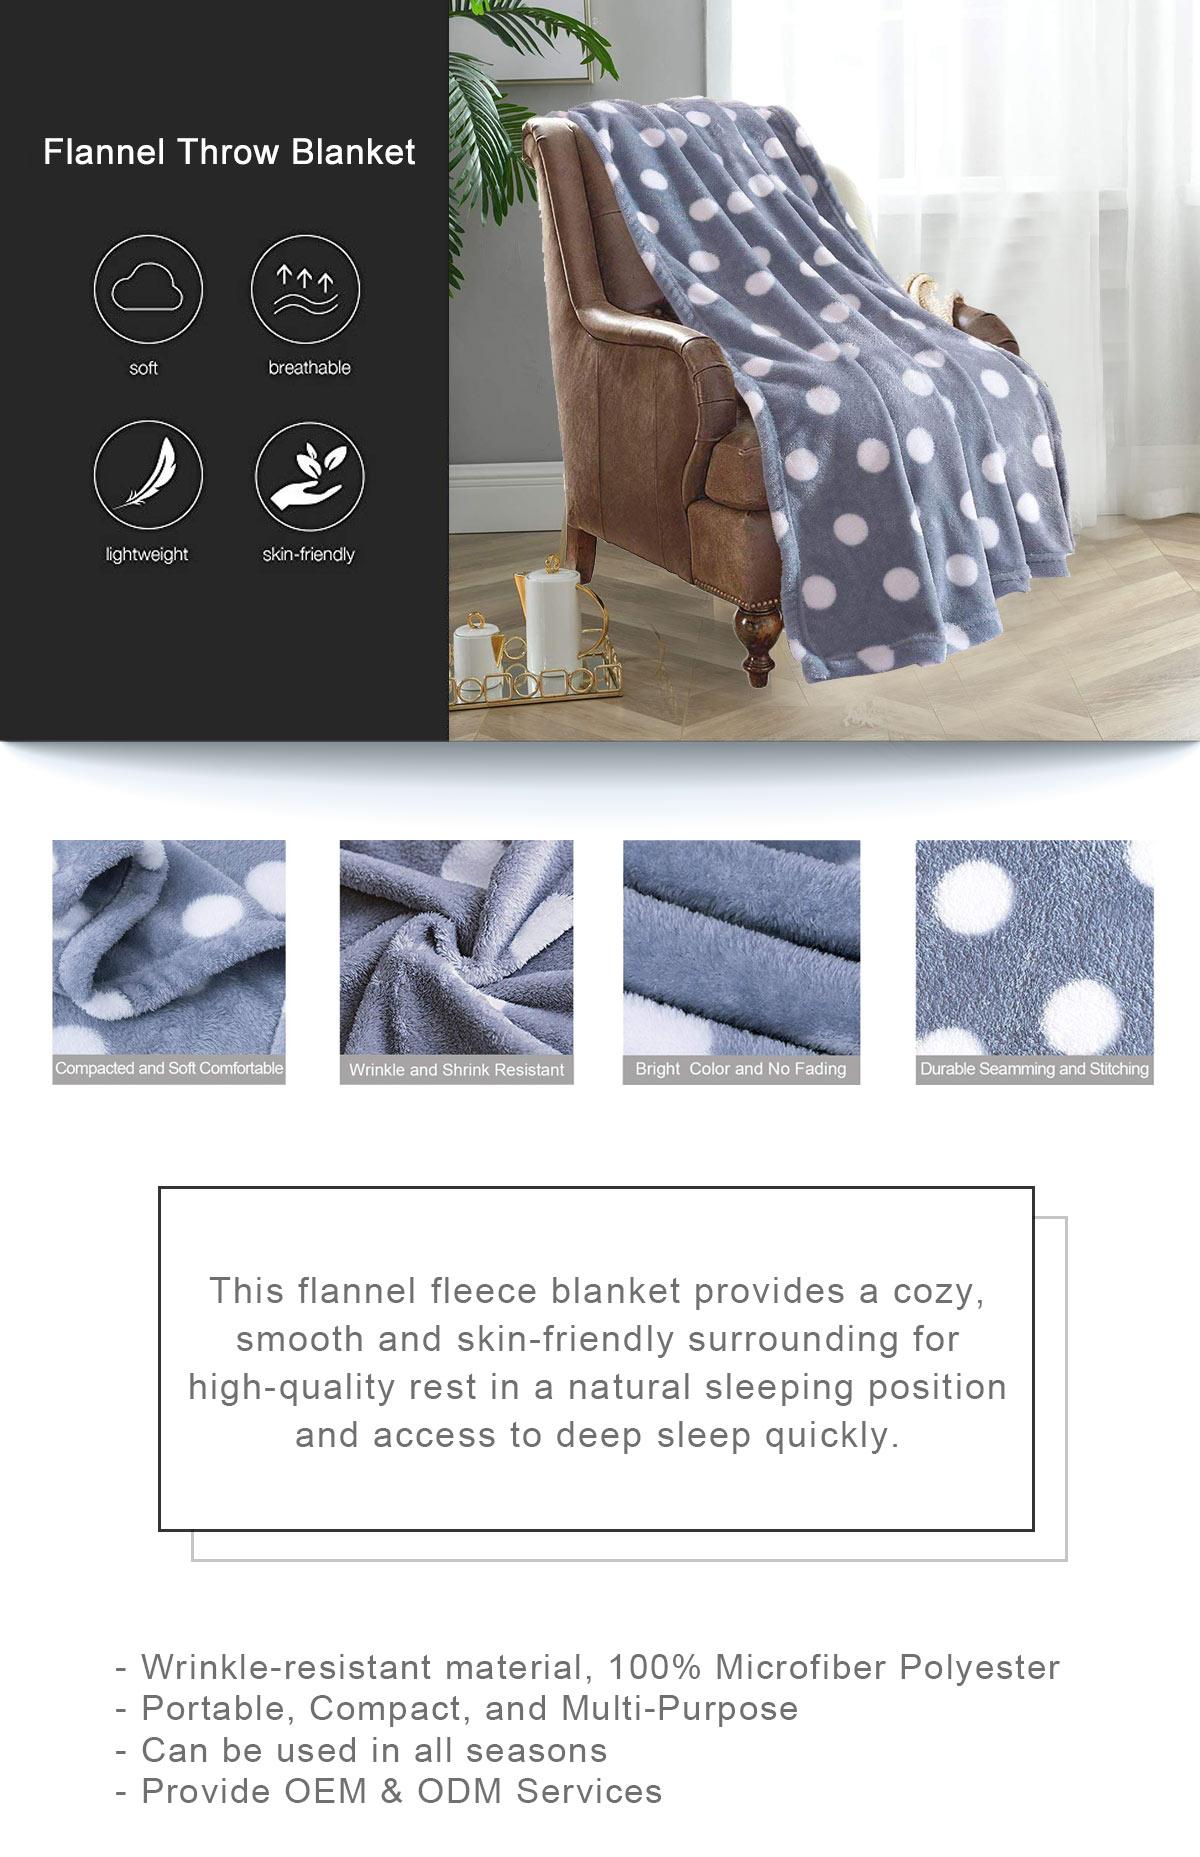 Flannel Throw Blanket